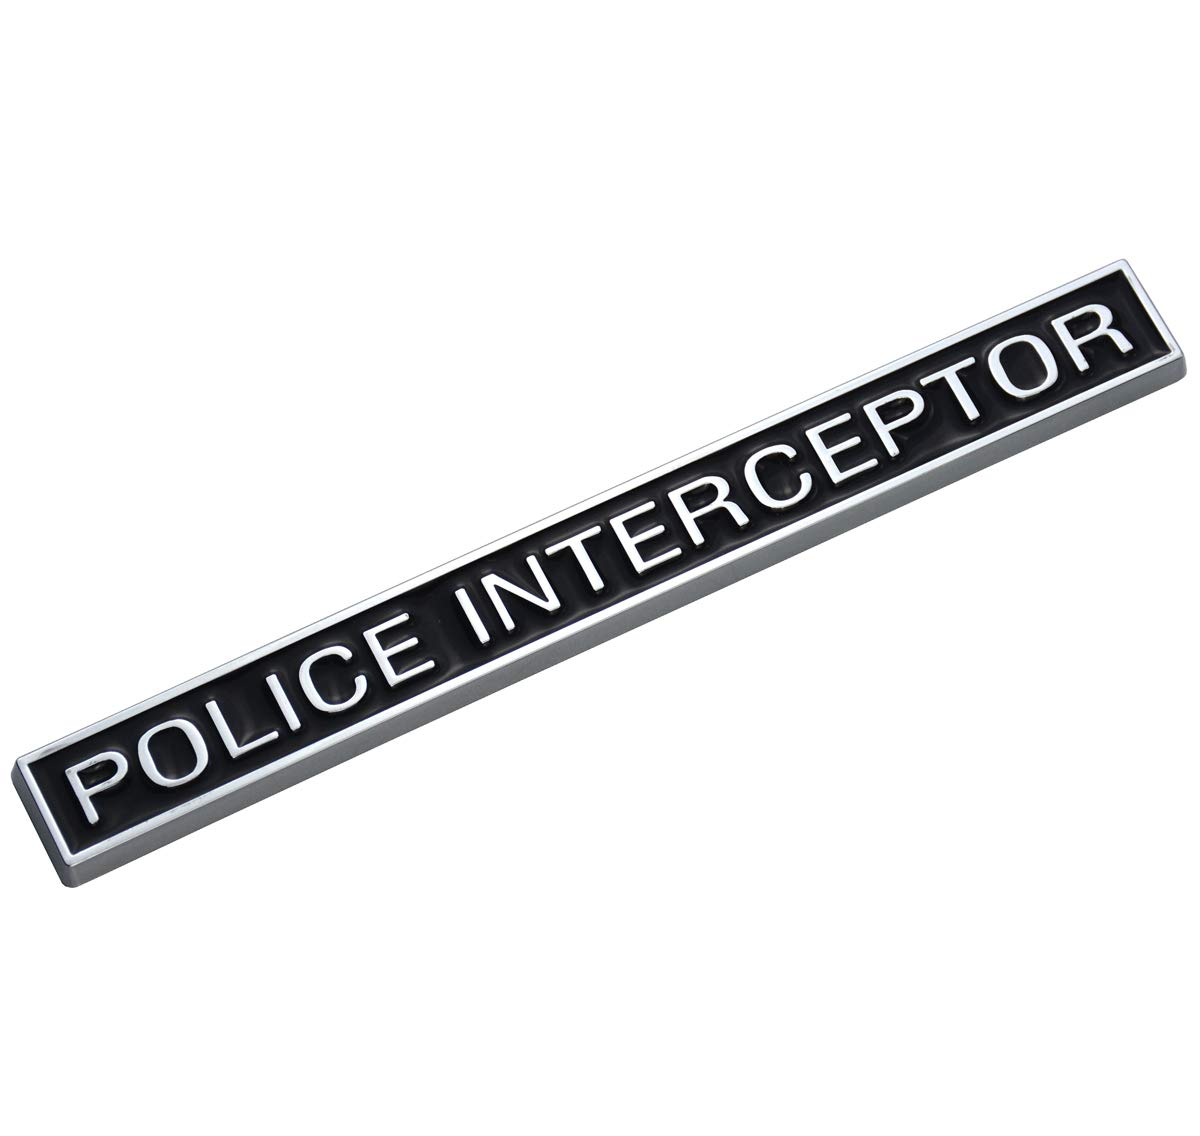 3D Emblems Trunk Nameplate Badge Sticker Decal Replacement for Ford Explorer EmbRoom Police Interceptor Emblem 2pcs Red